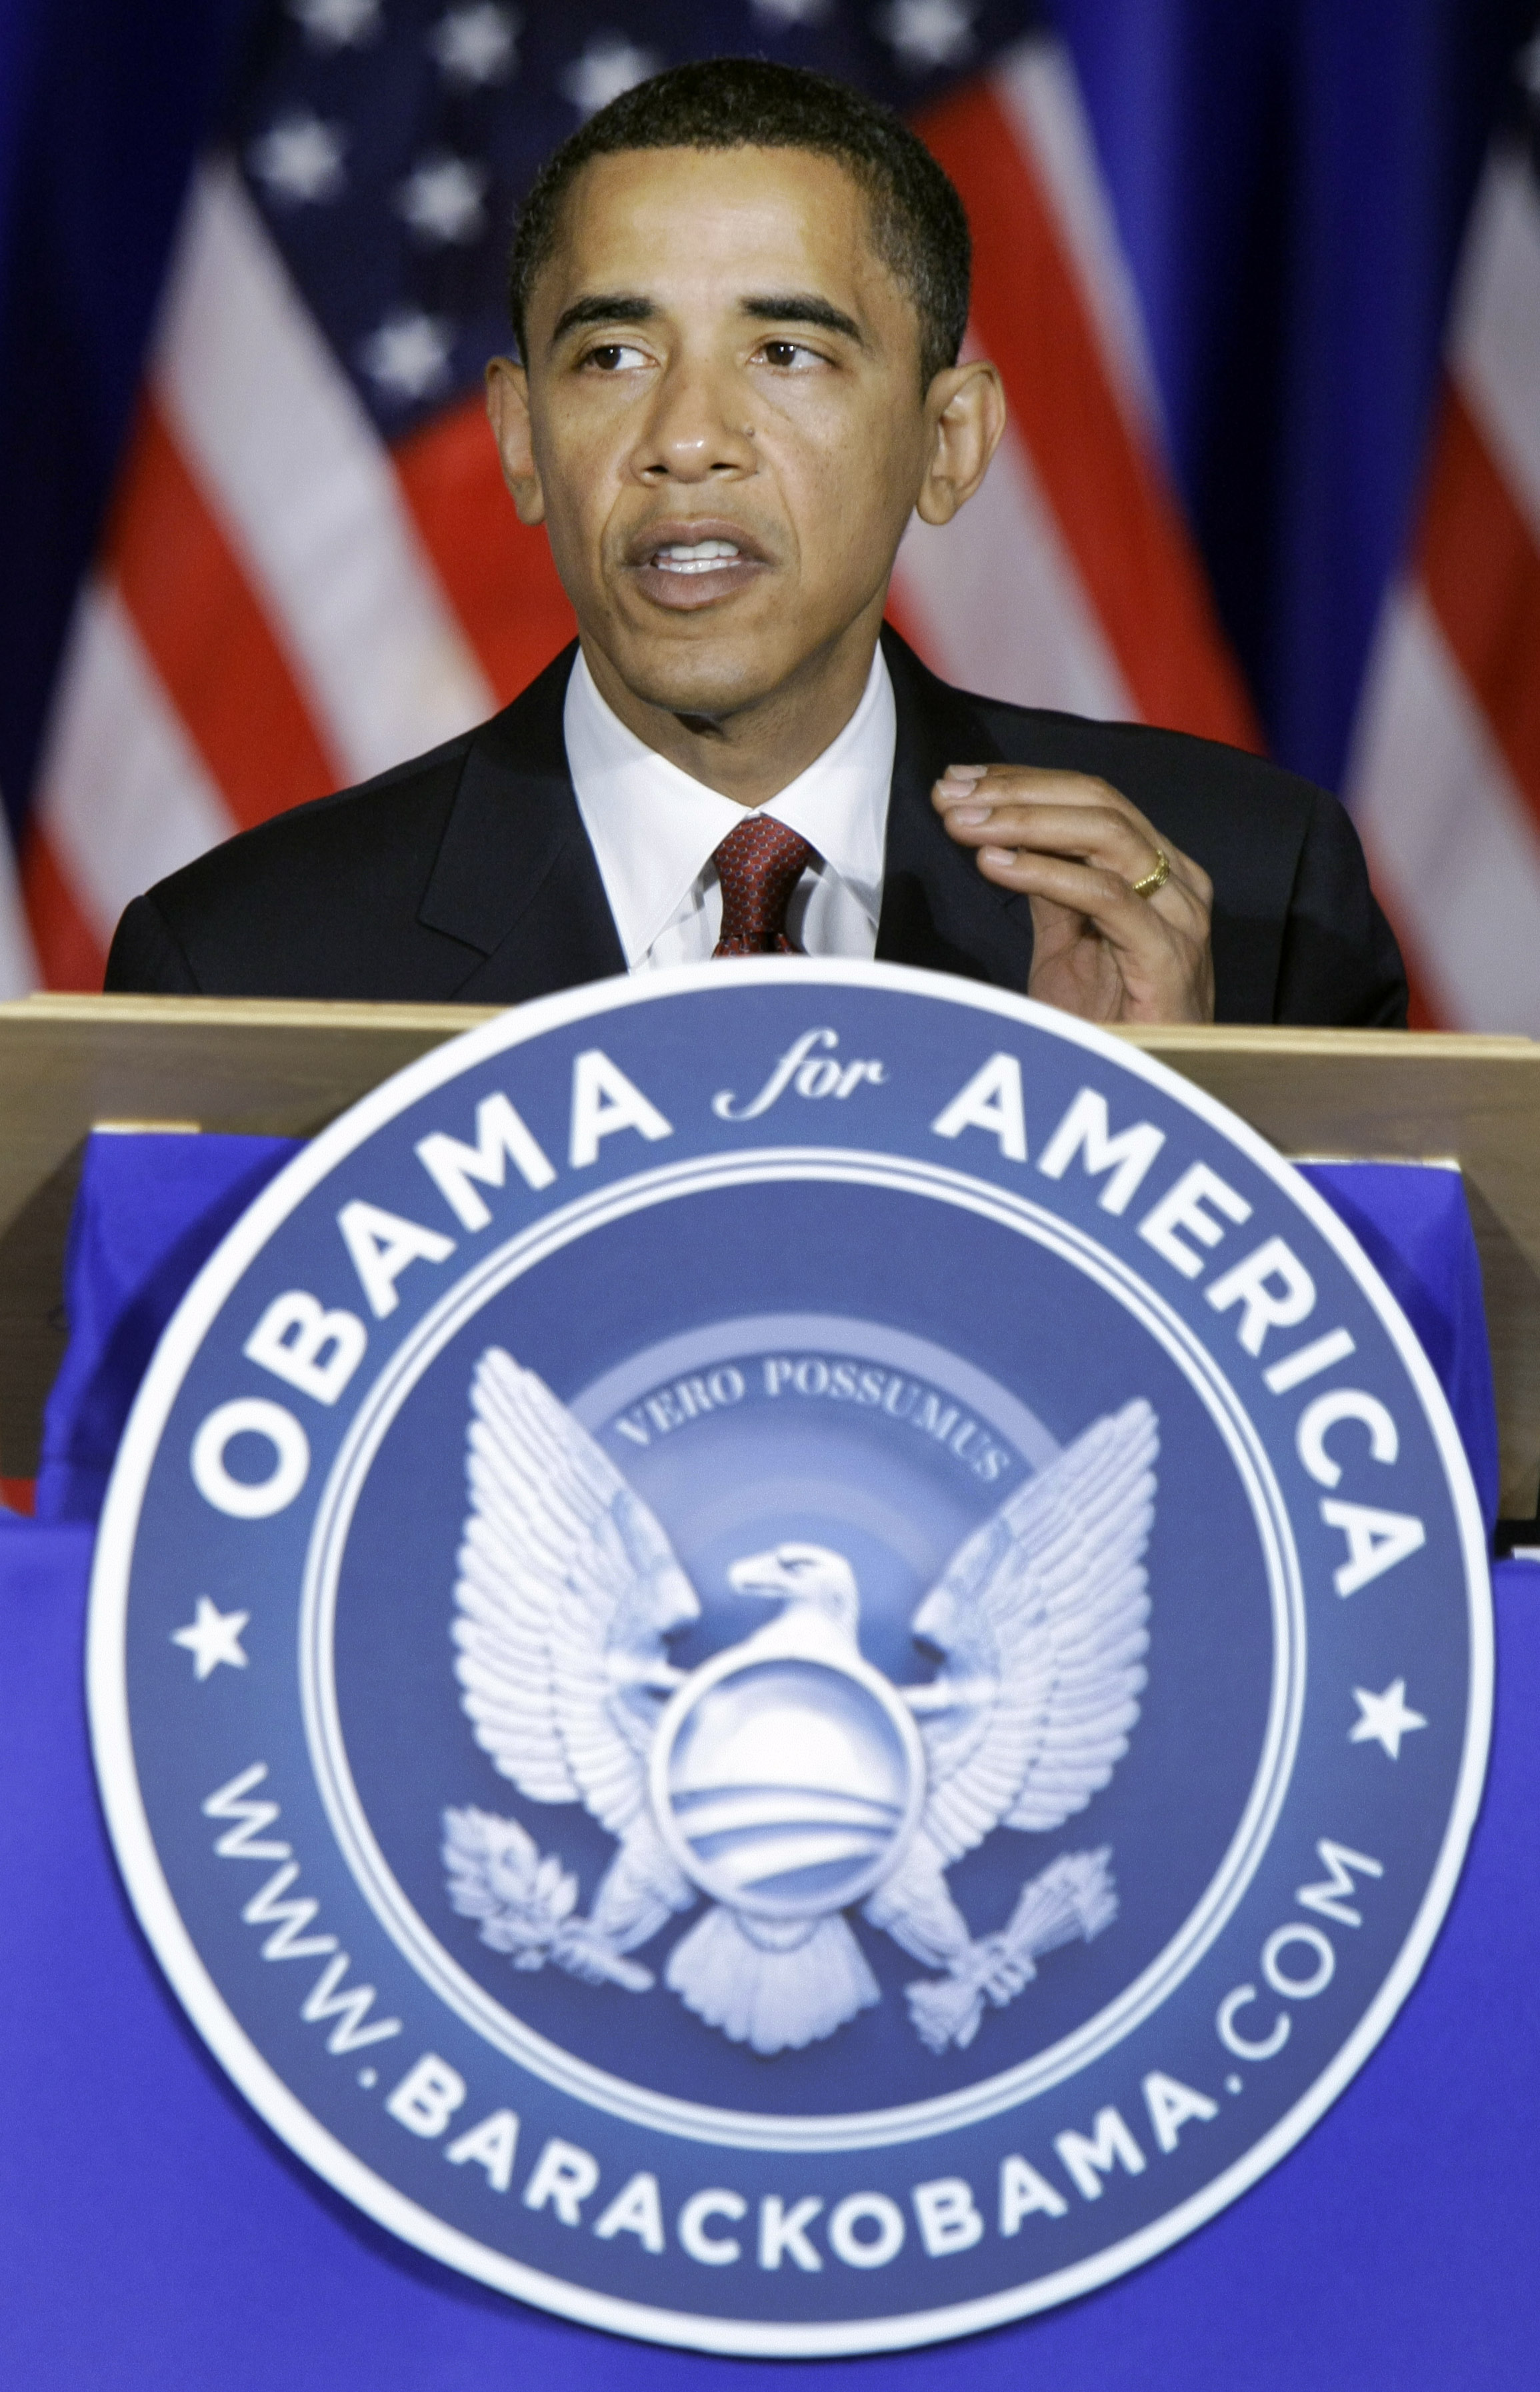 Obama Ground Zero June 14 Obama Seal